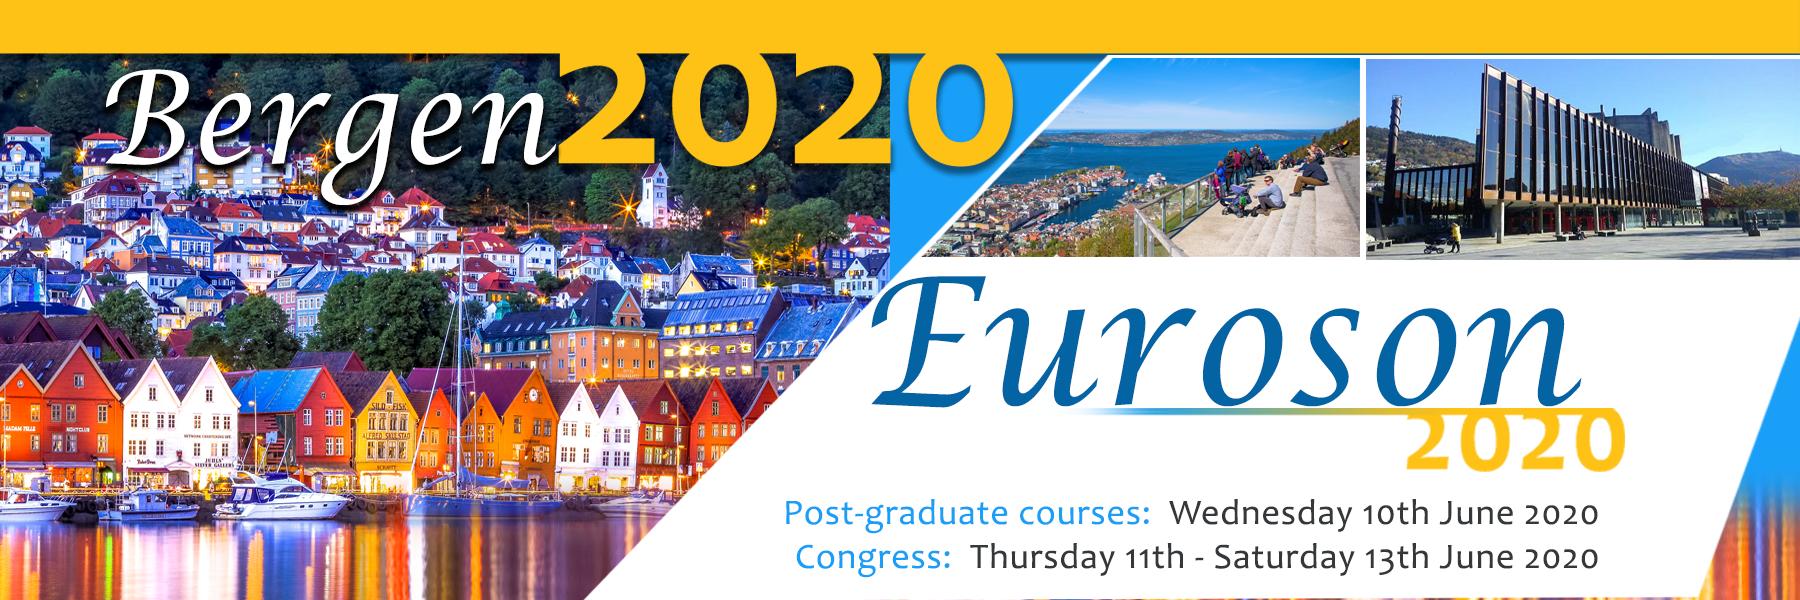 EUROSON 2020, Bergen